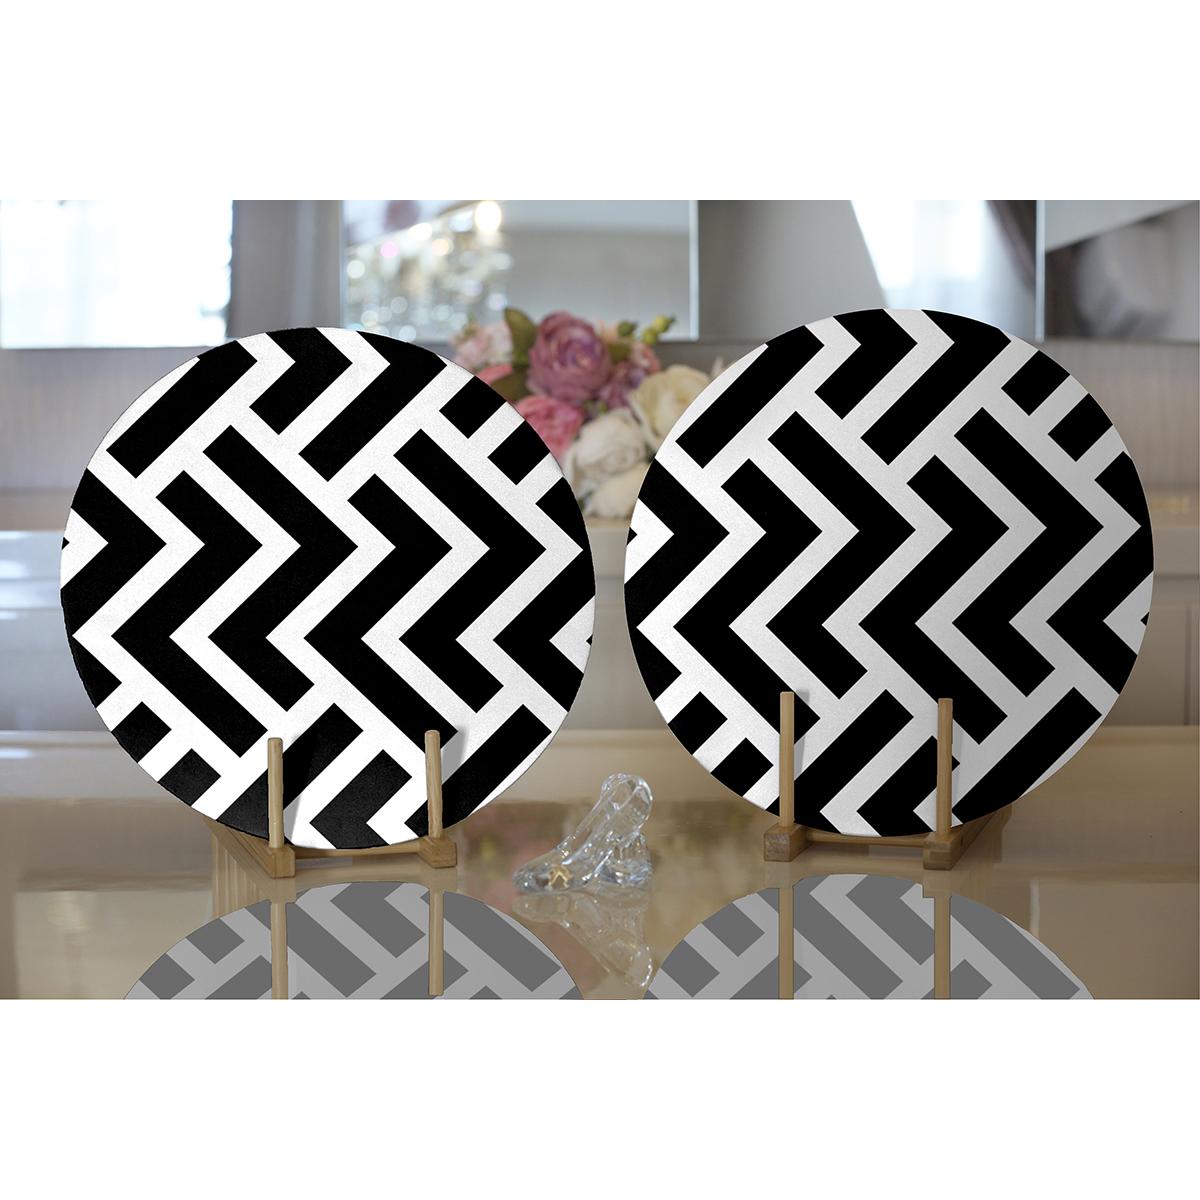 Realhomes Siyah Beyaz Geometrik Desenli Modern 2'li Yuvarlak Servis Altlığı - Supla Realhomes